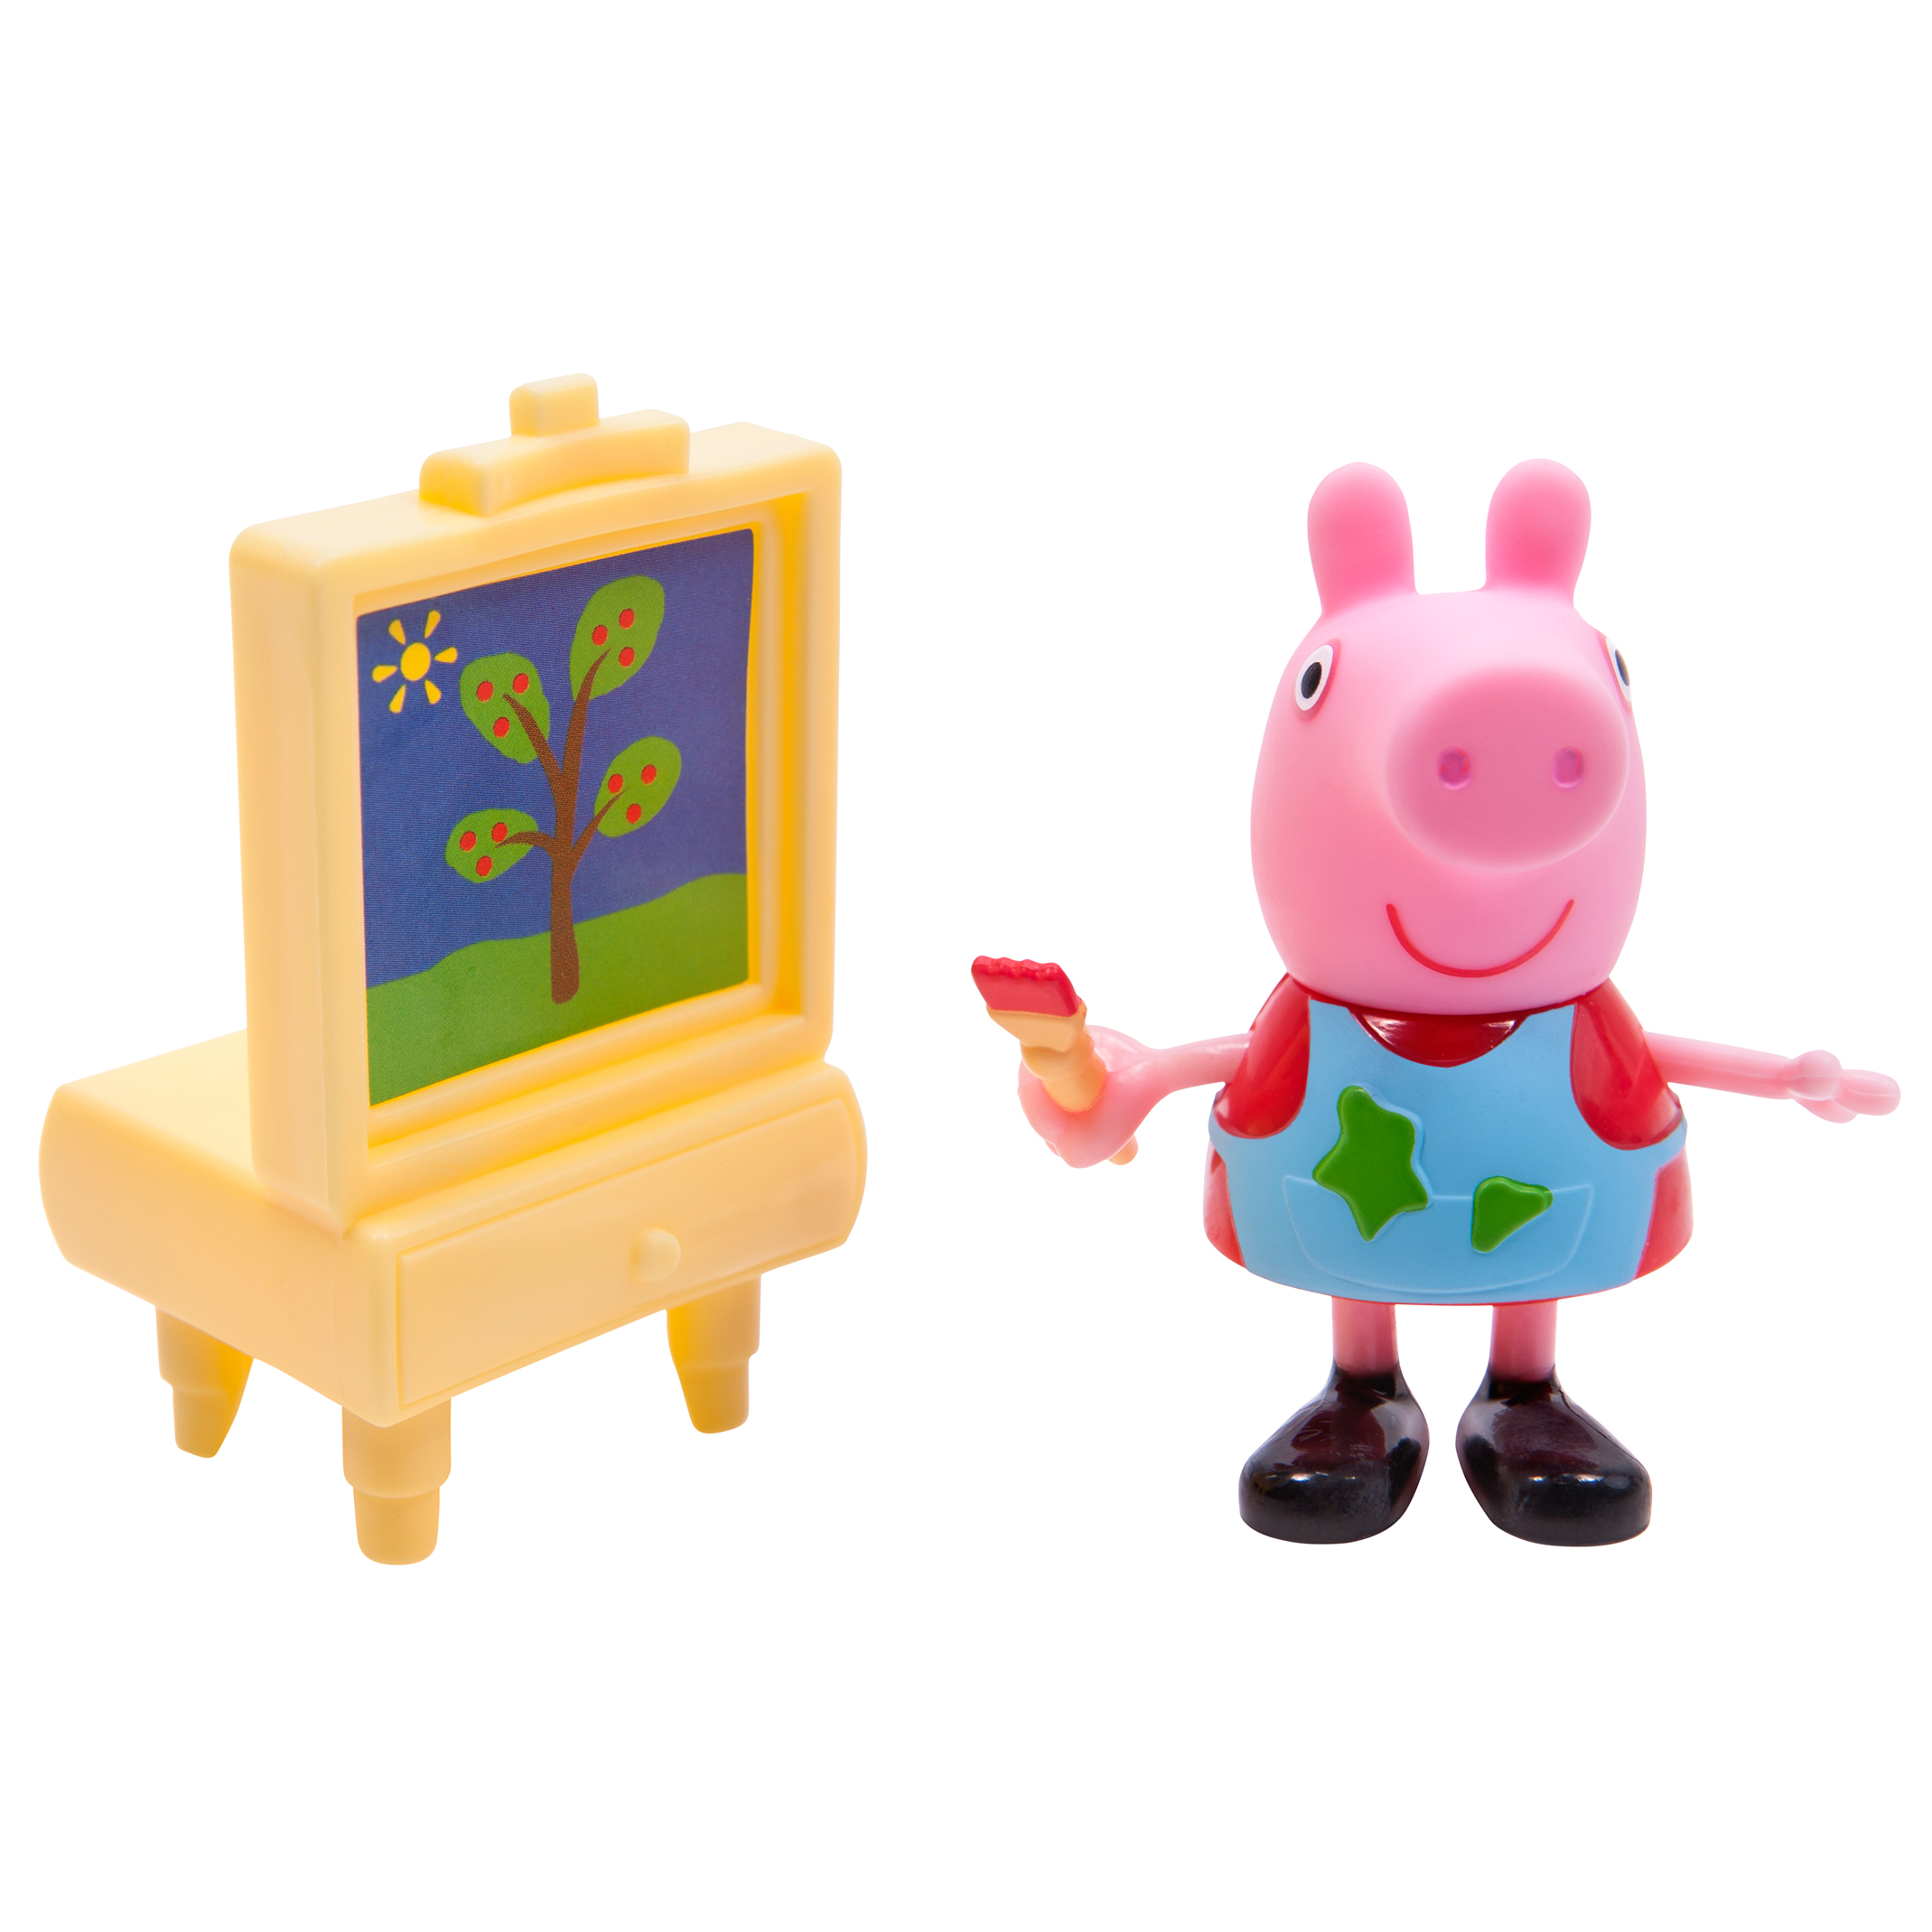 Peppa Pig Peppa W/ Painting